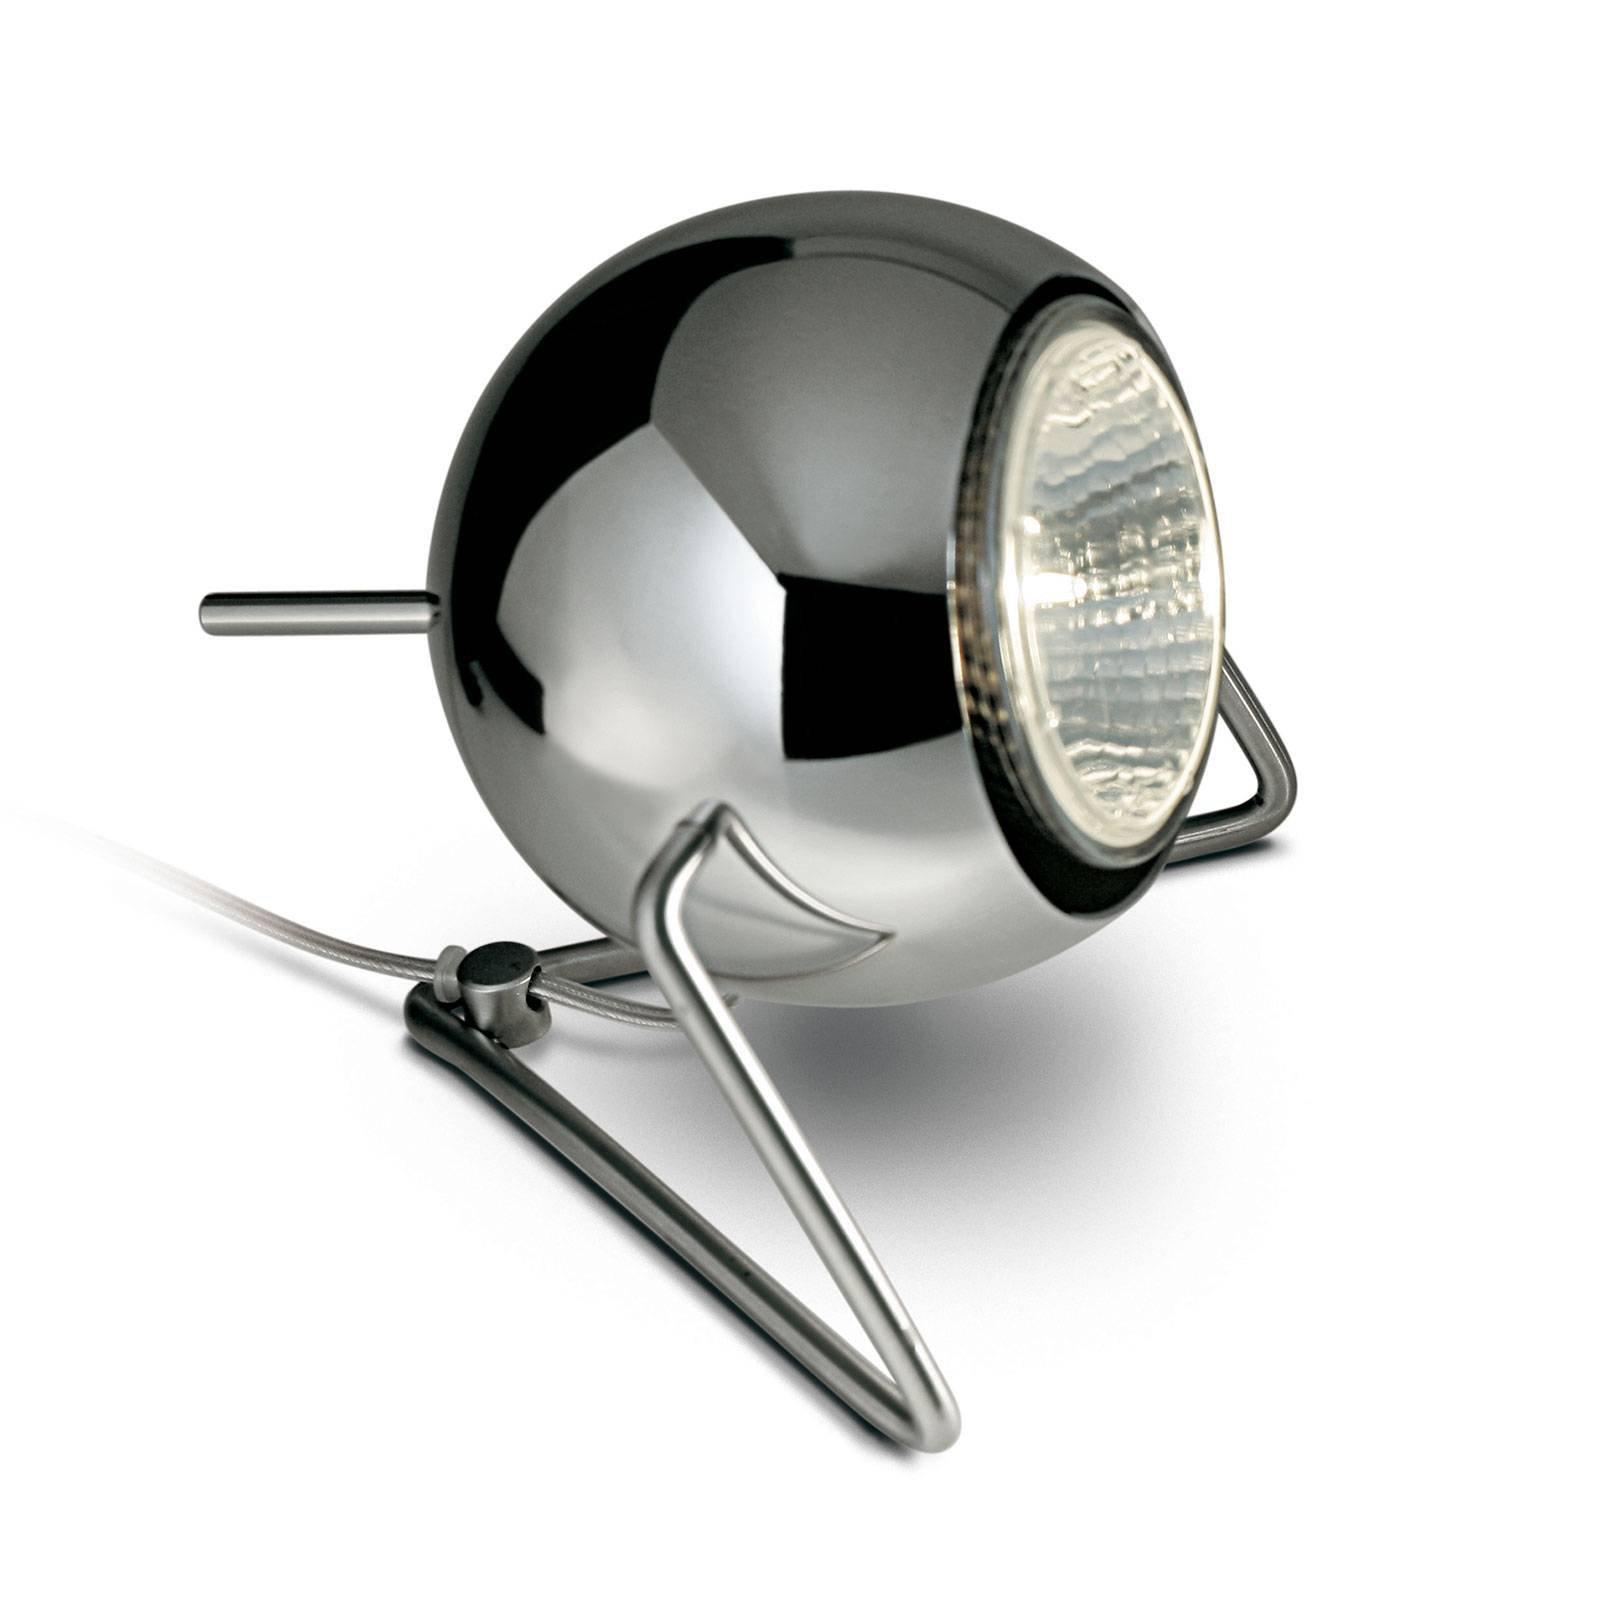 Fabbian Beluga Steel bordlampe Ø 9 cm, krom